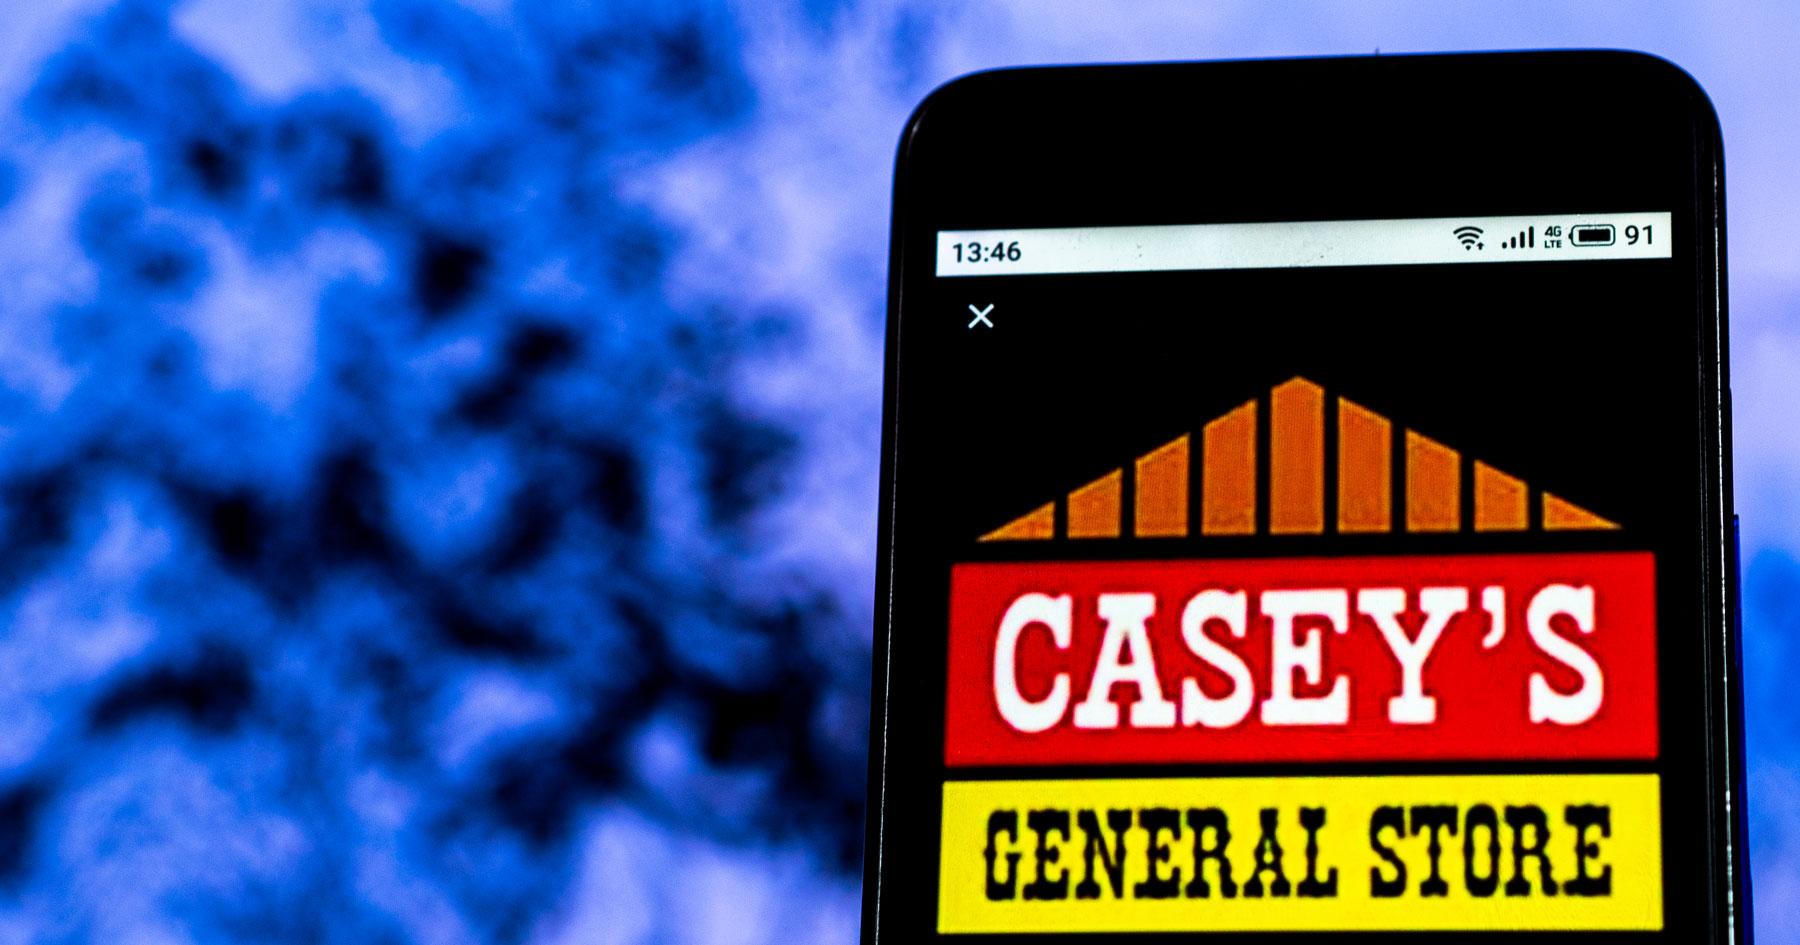 caseys phone